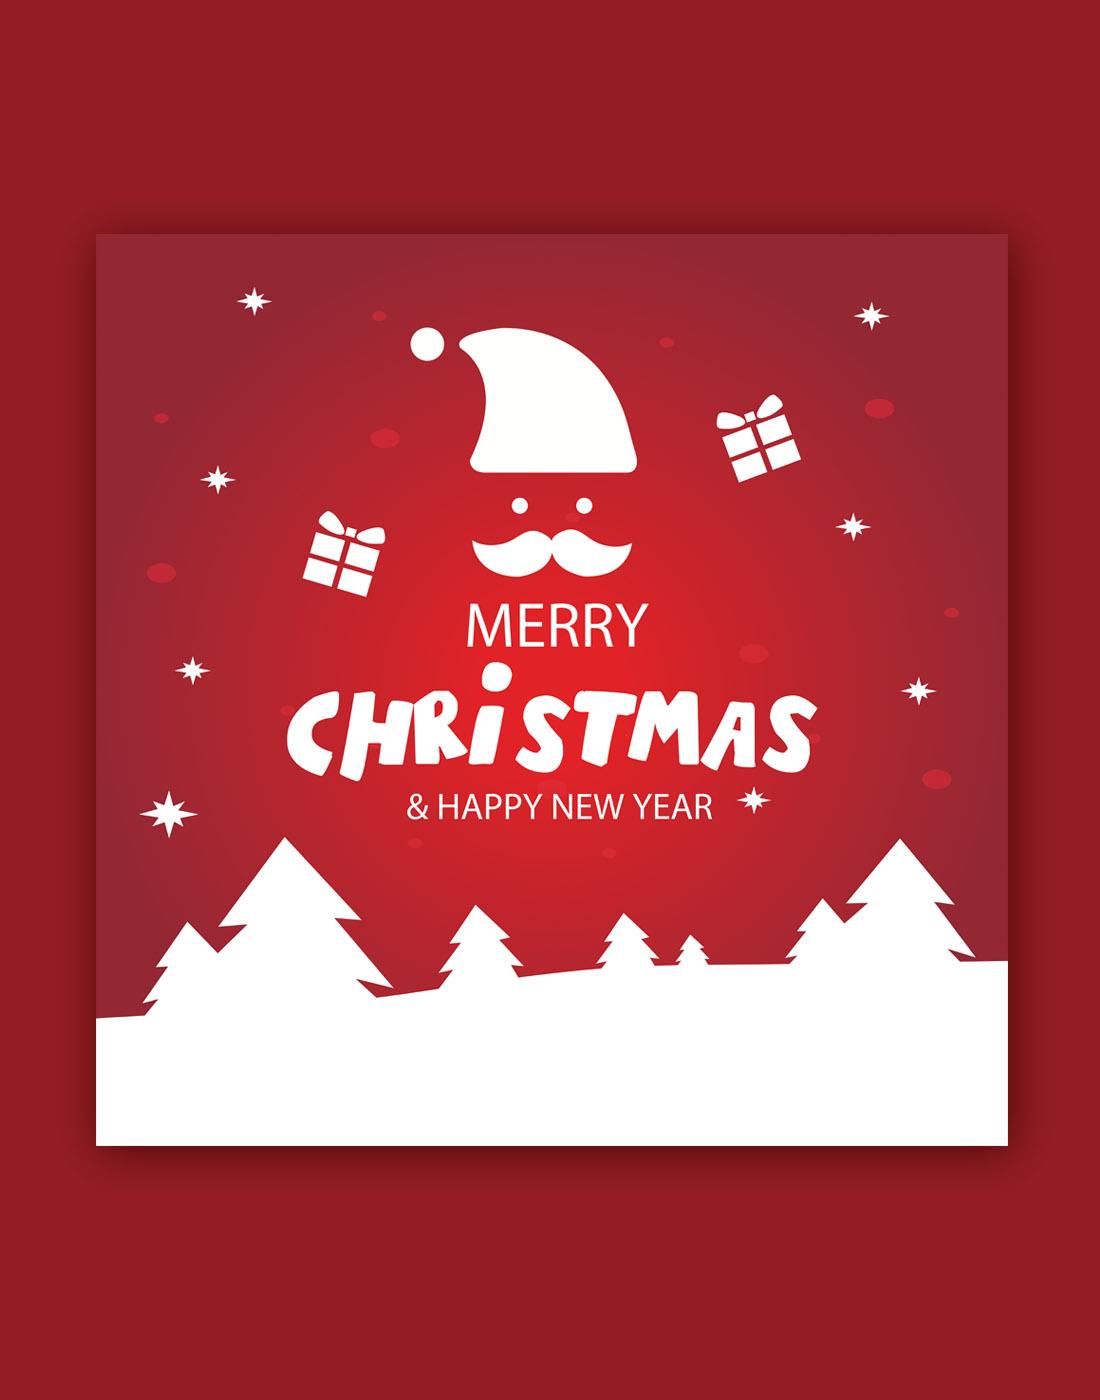 merry_Christmas_vector